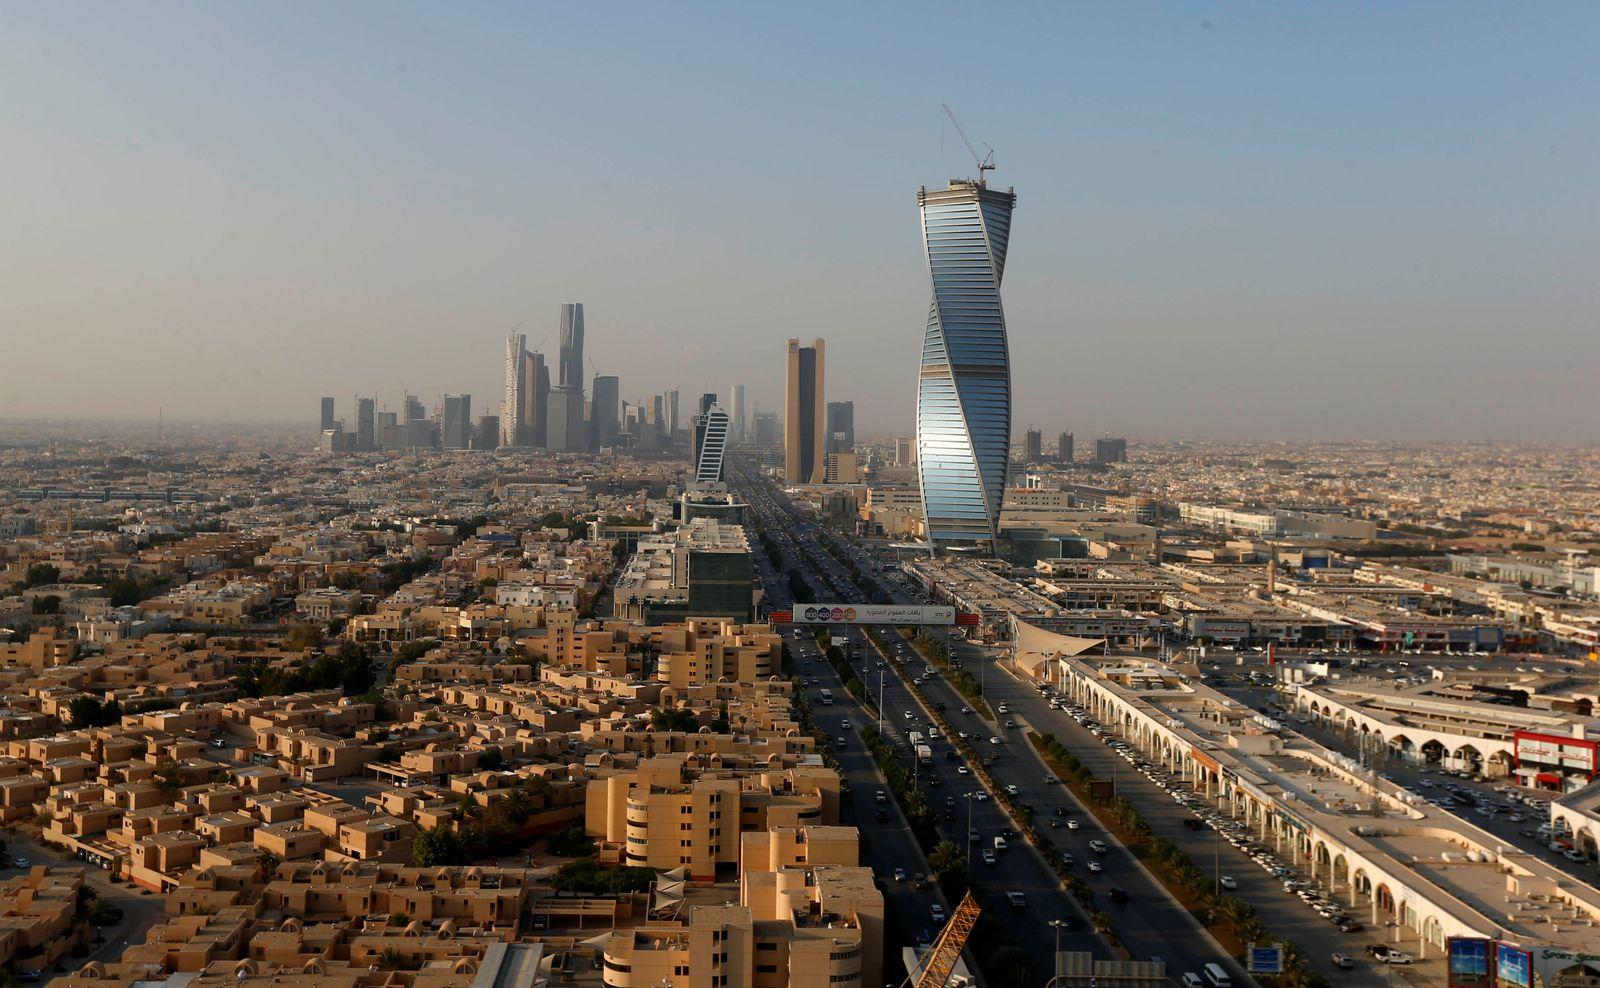 Riyadh/ Saudi Arabia